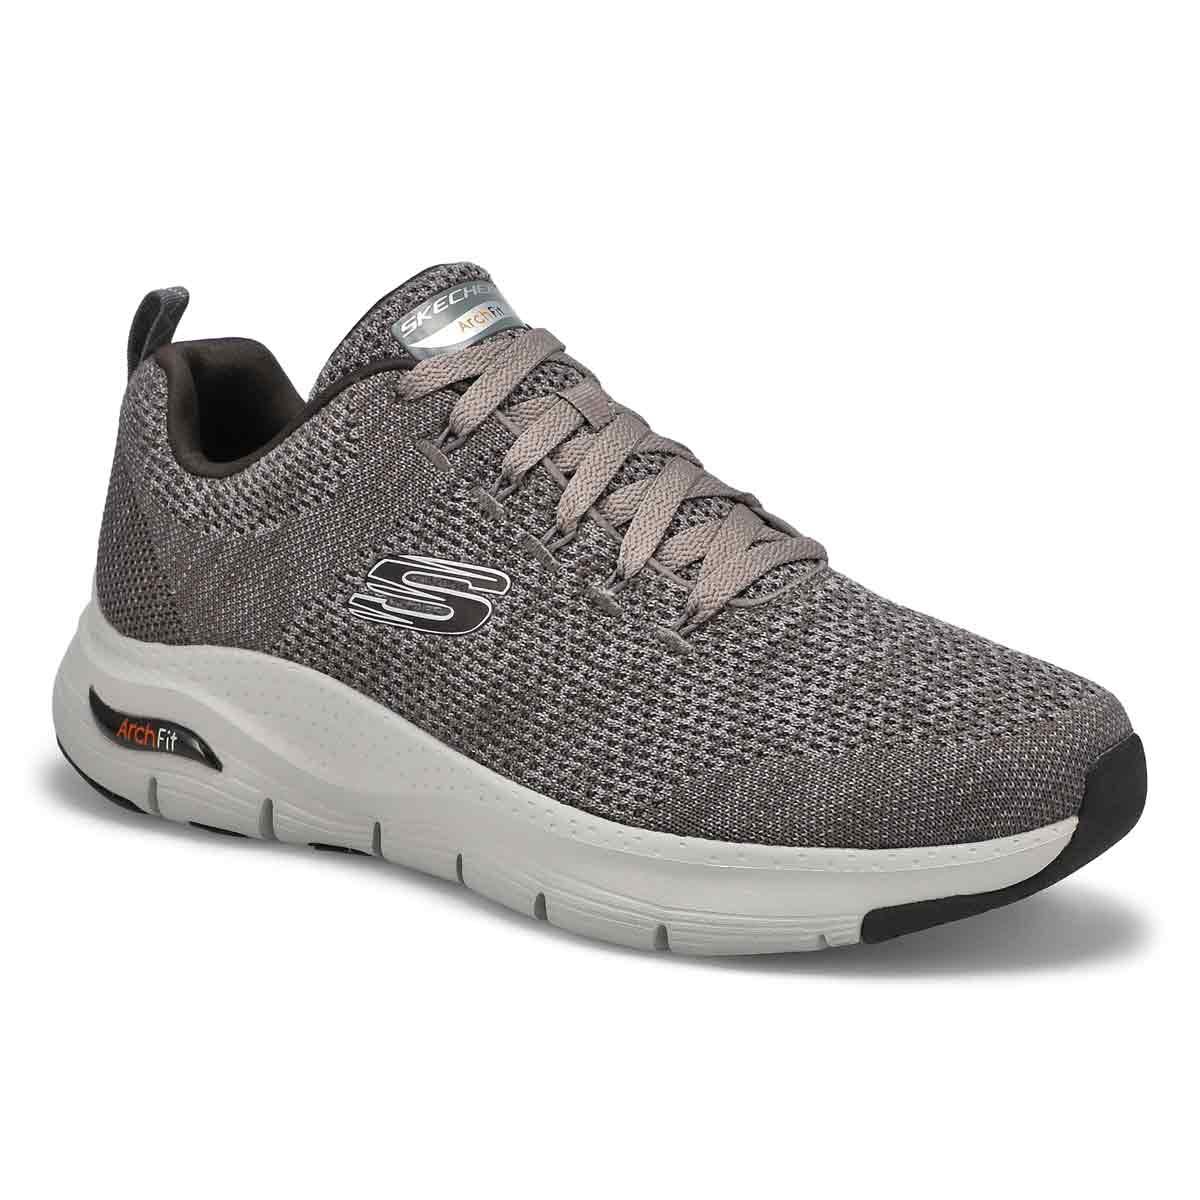 Men's Arch Fit Paradyme Sneakers - Grey